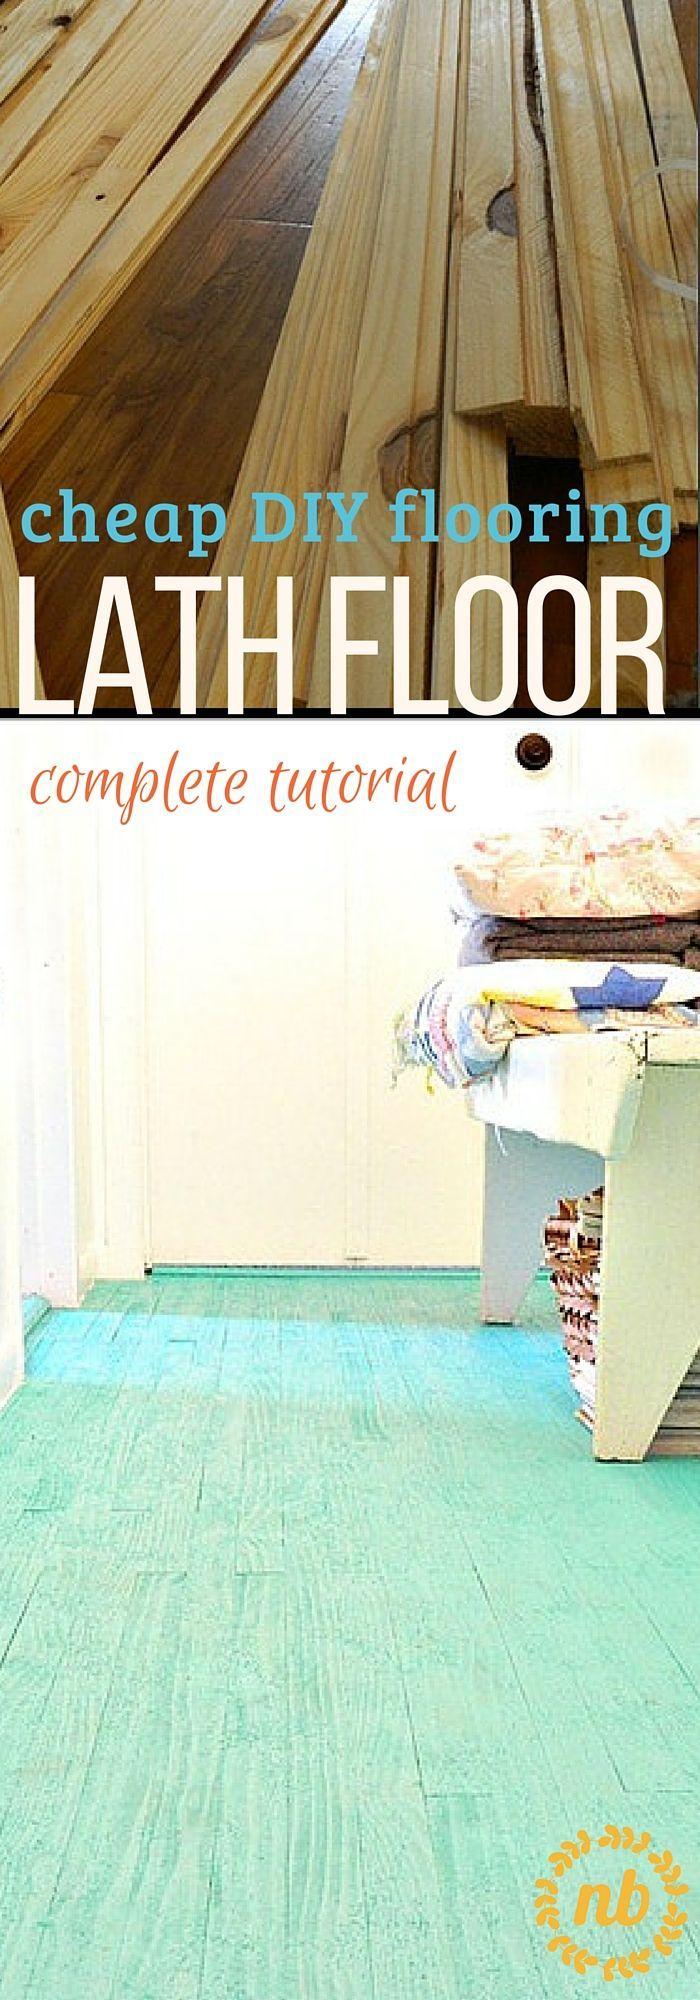 Cheap flooring idea lath floor tutorial Inexpensive